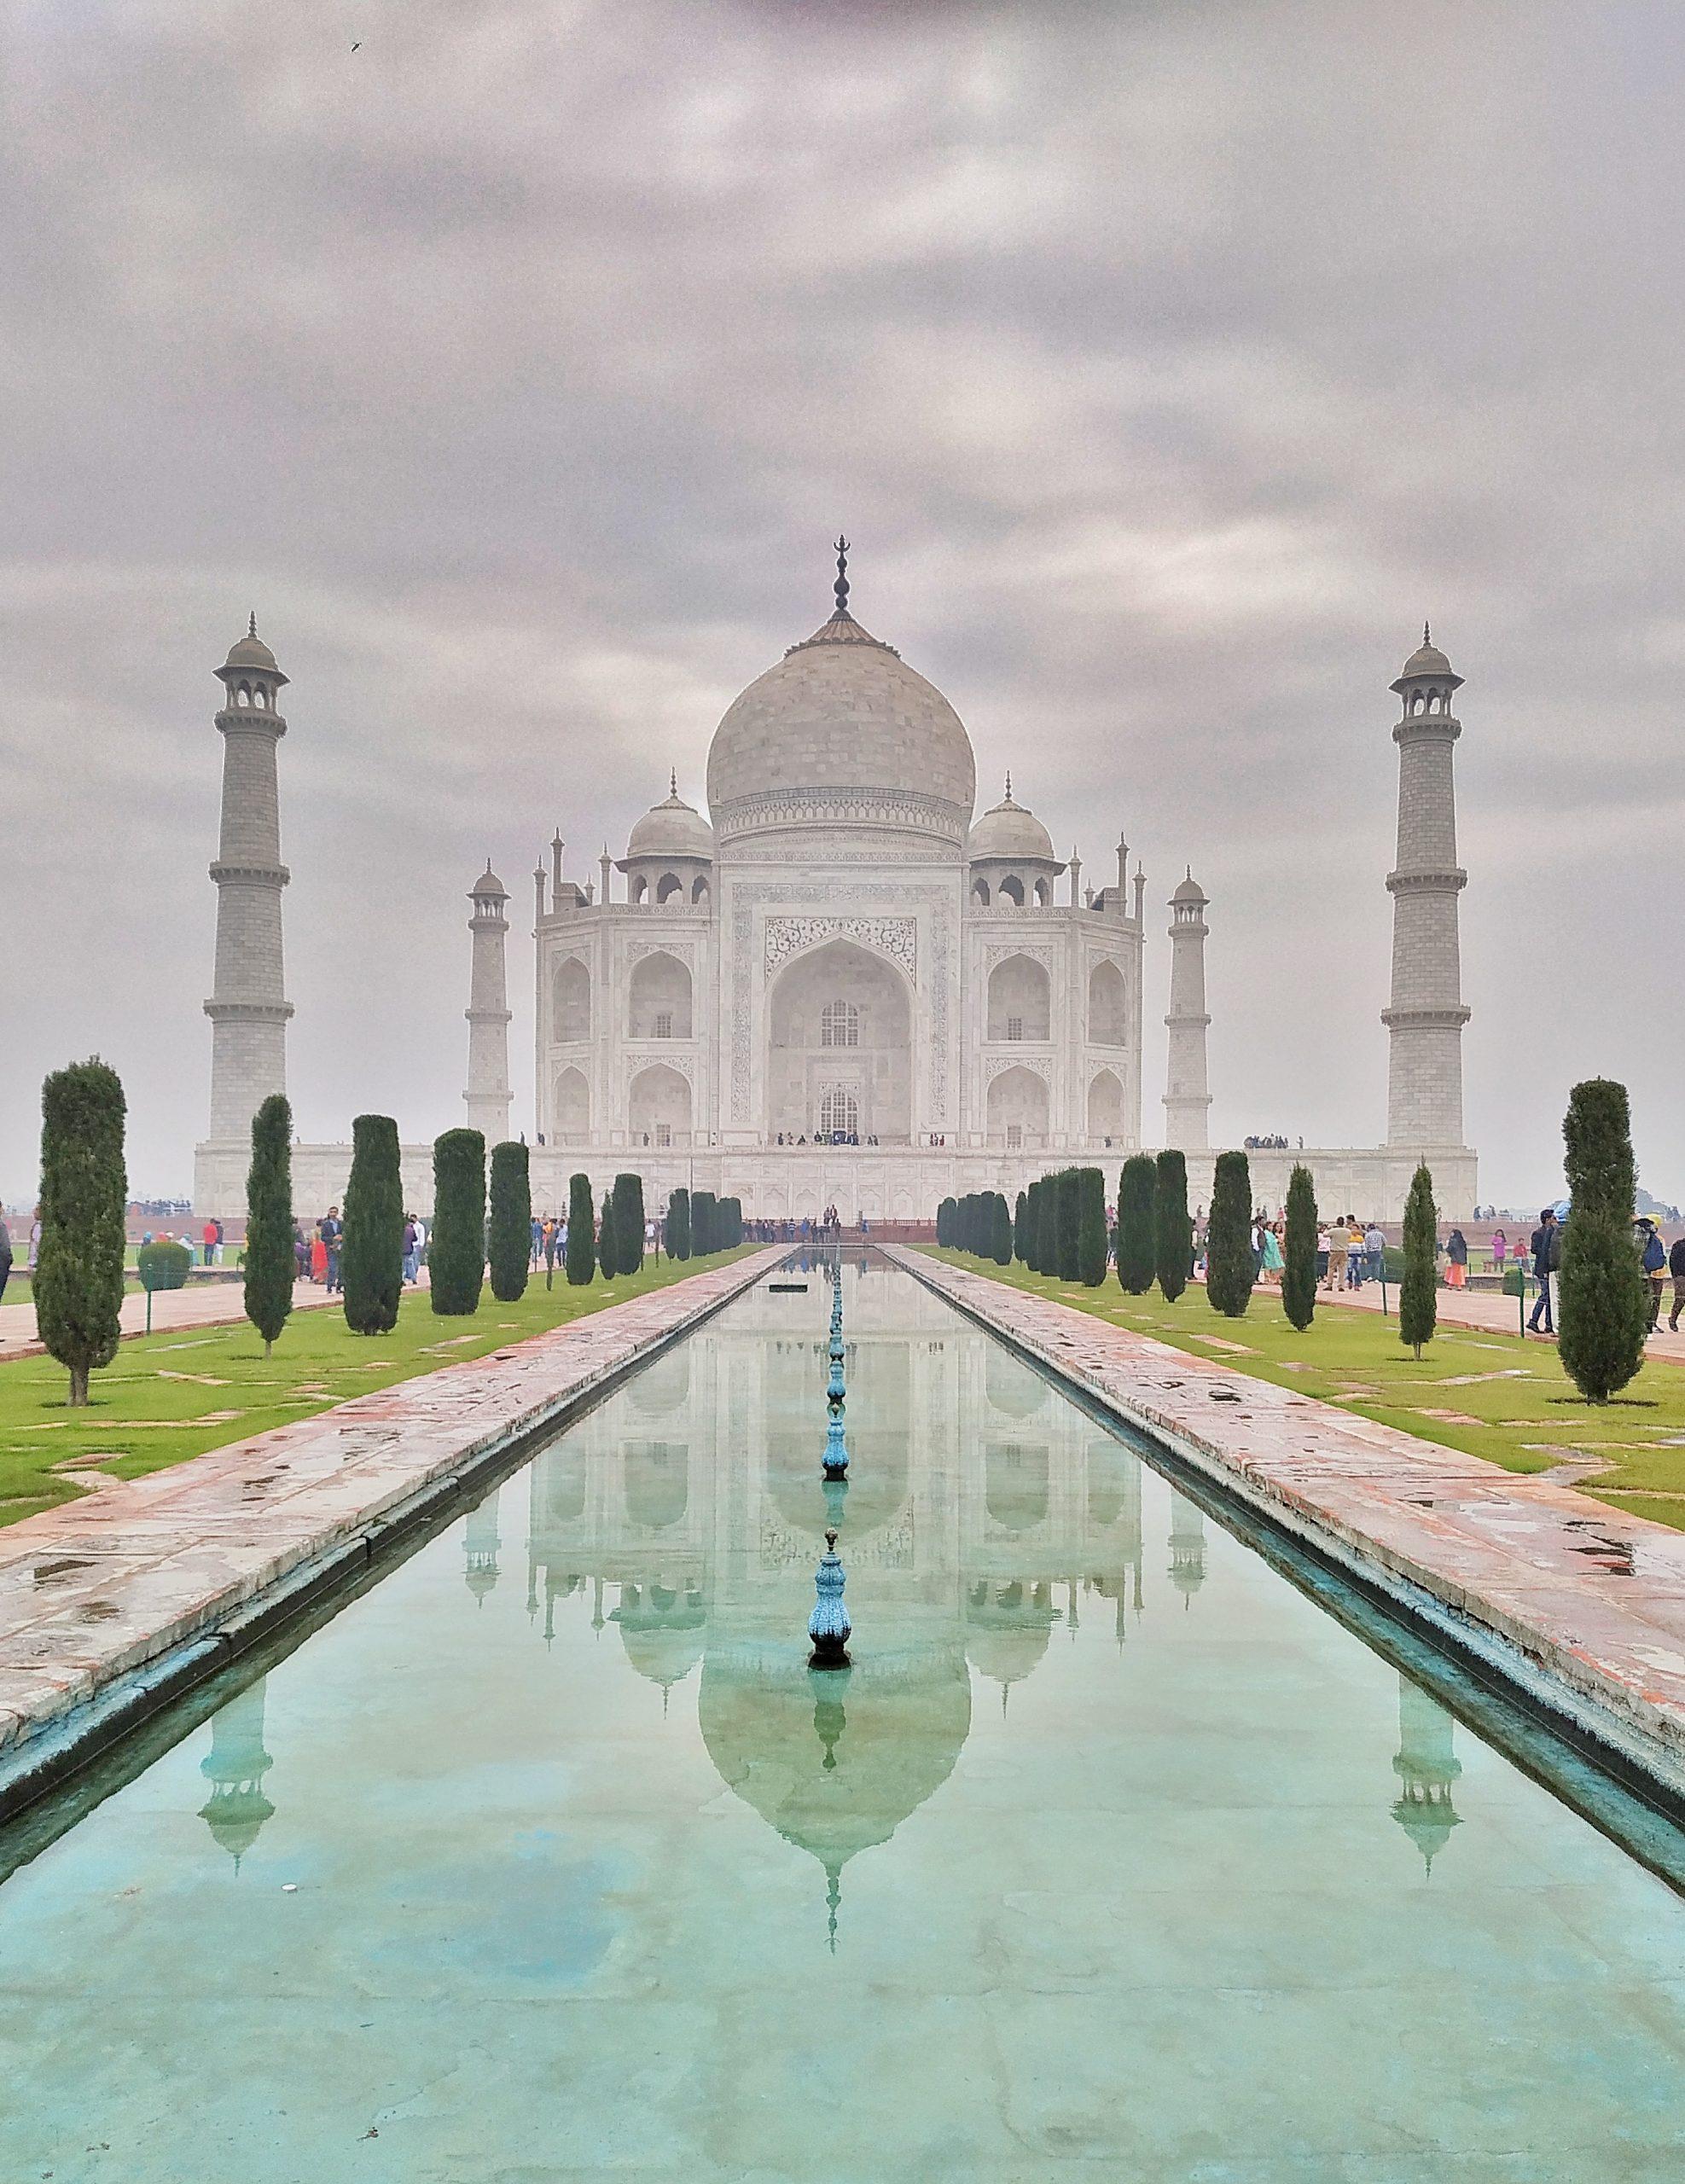 Taj Mahal Garden Agra, India